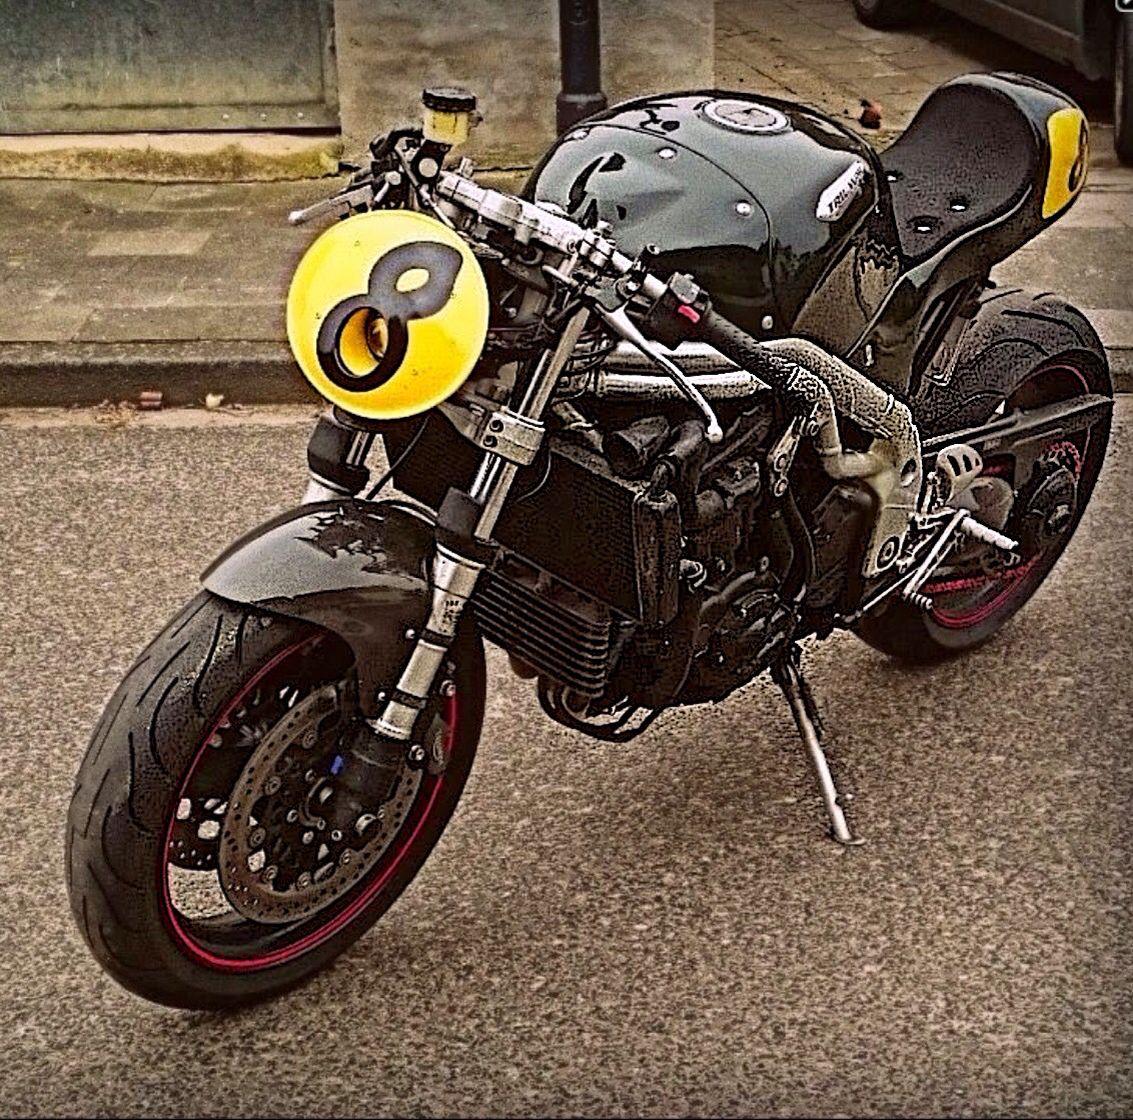 99garage | Cafe Racers Customs Passion Inspiration | Cafe racer, Auto, Motori